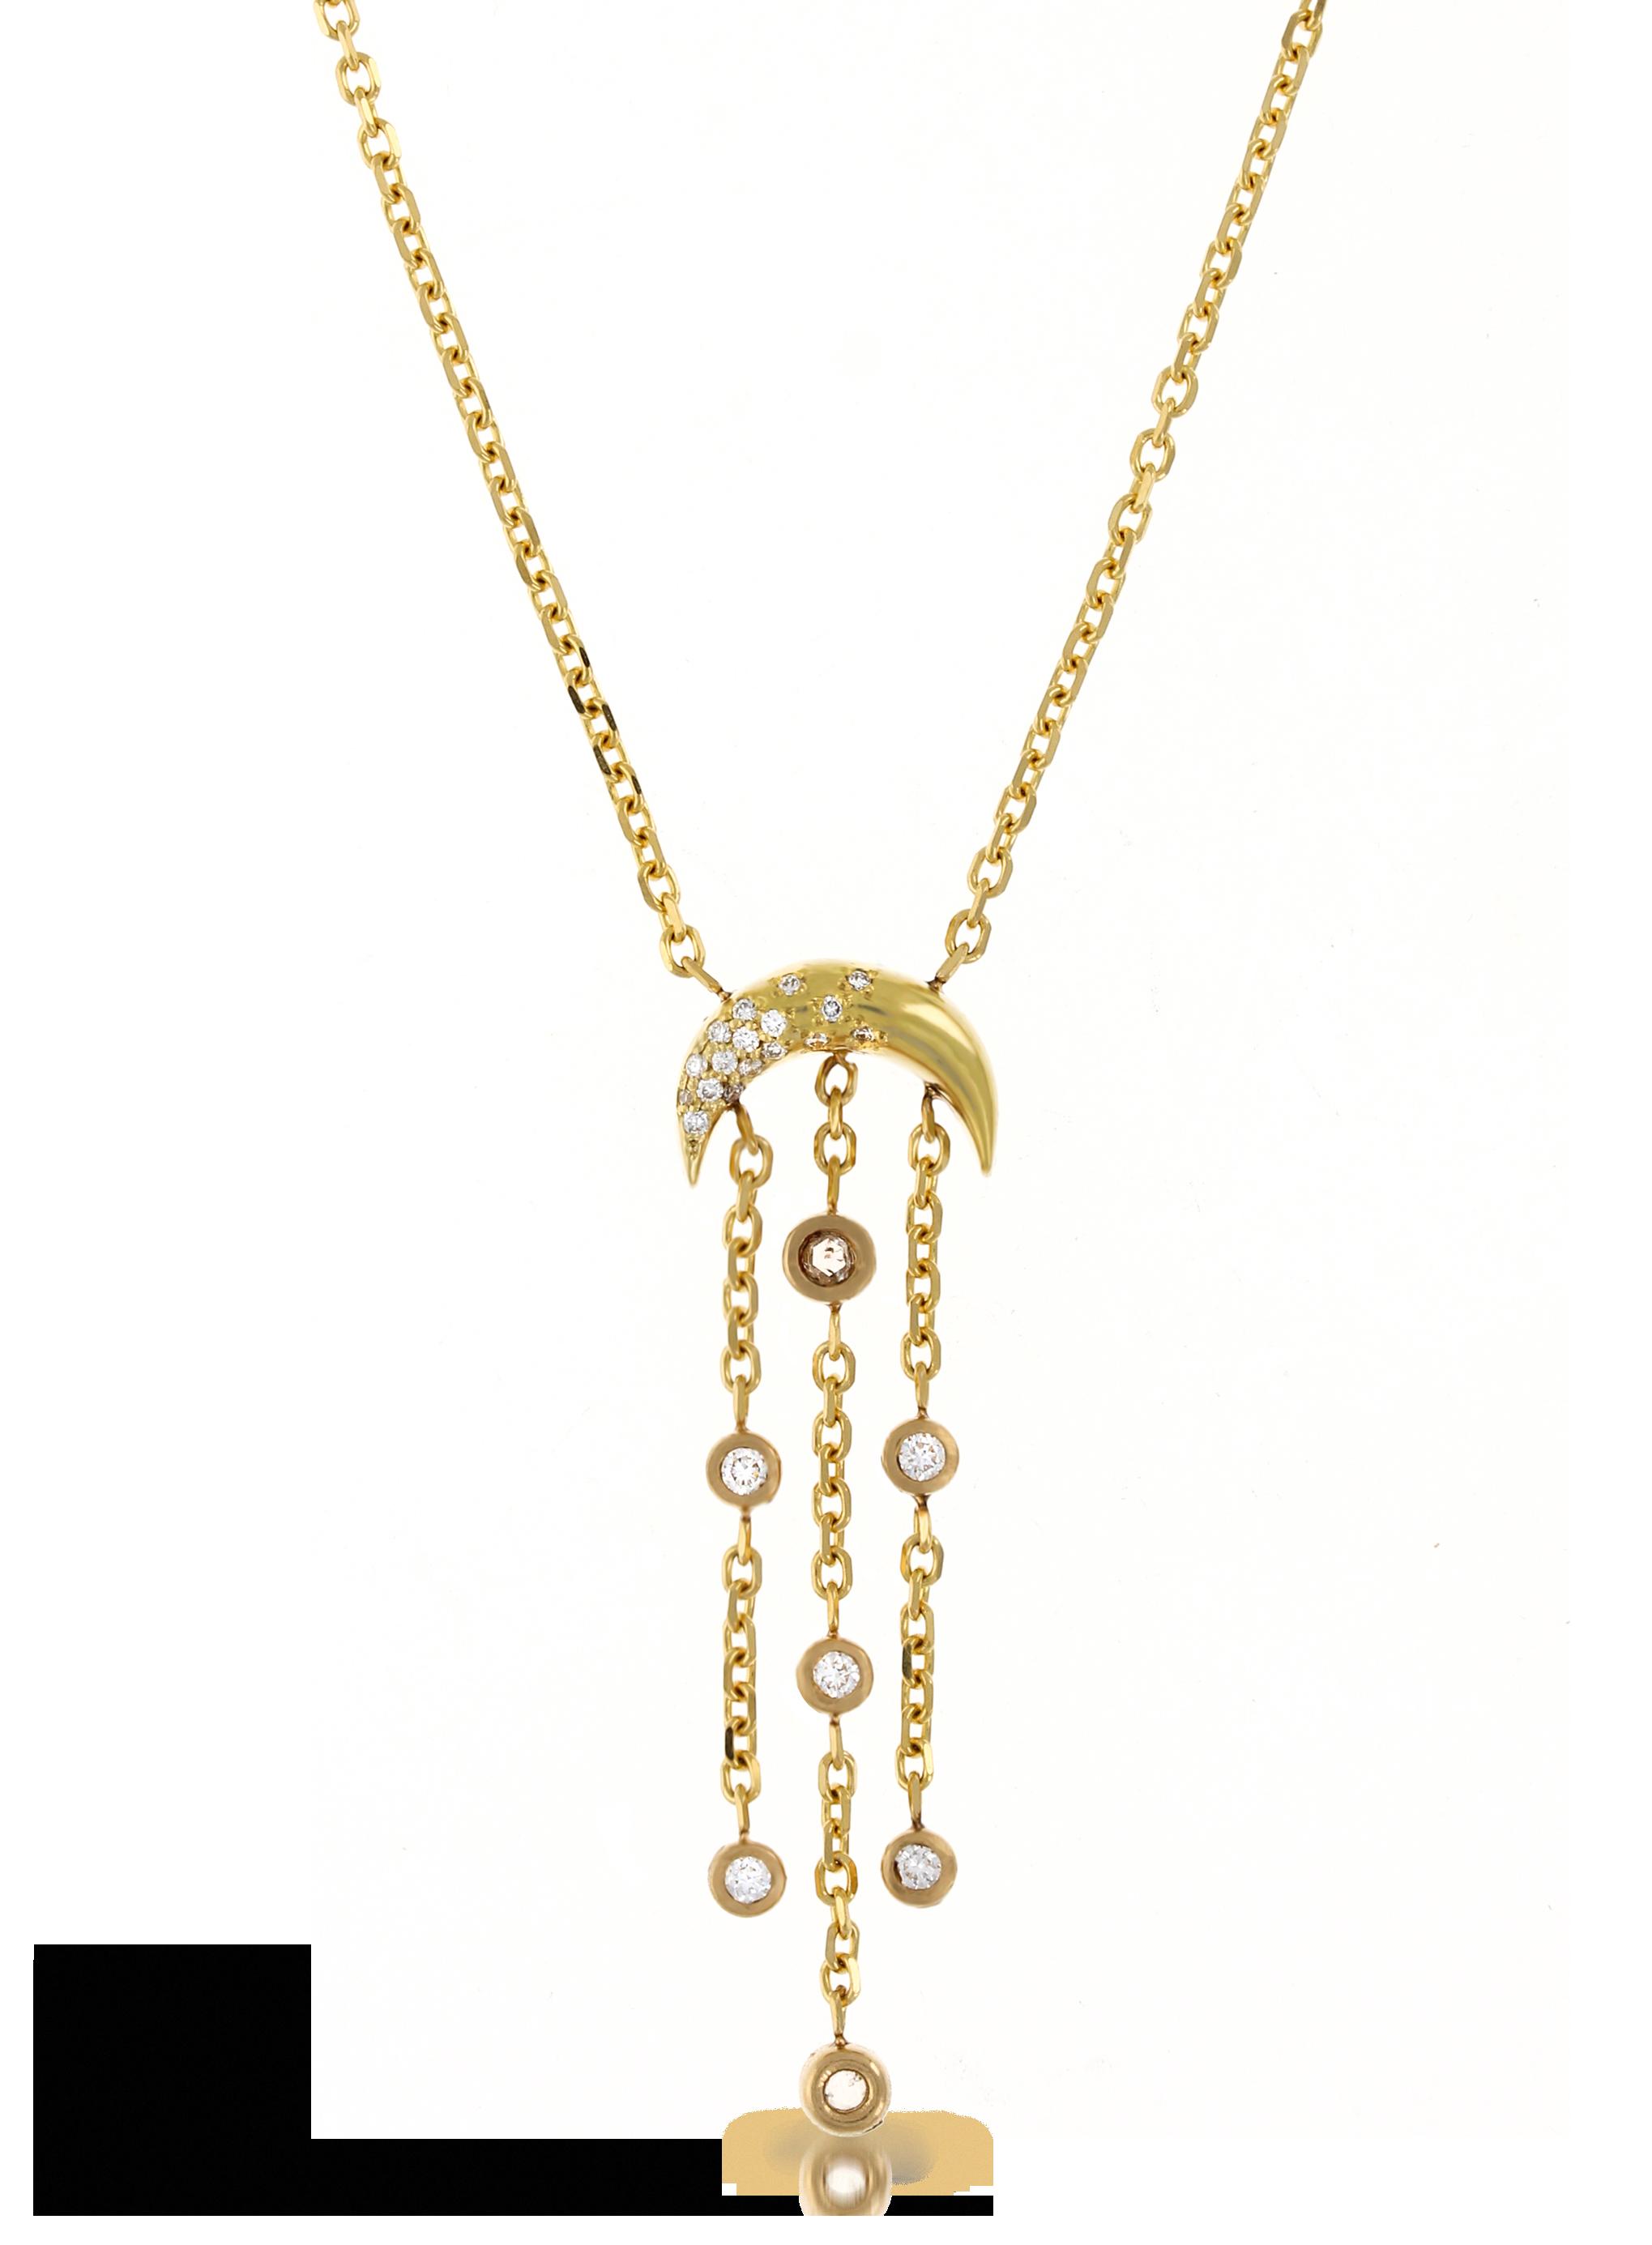 Best Necklace (Under $5,000) – 2019 Winners